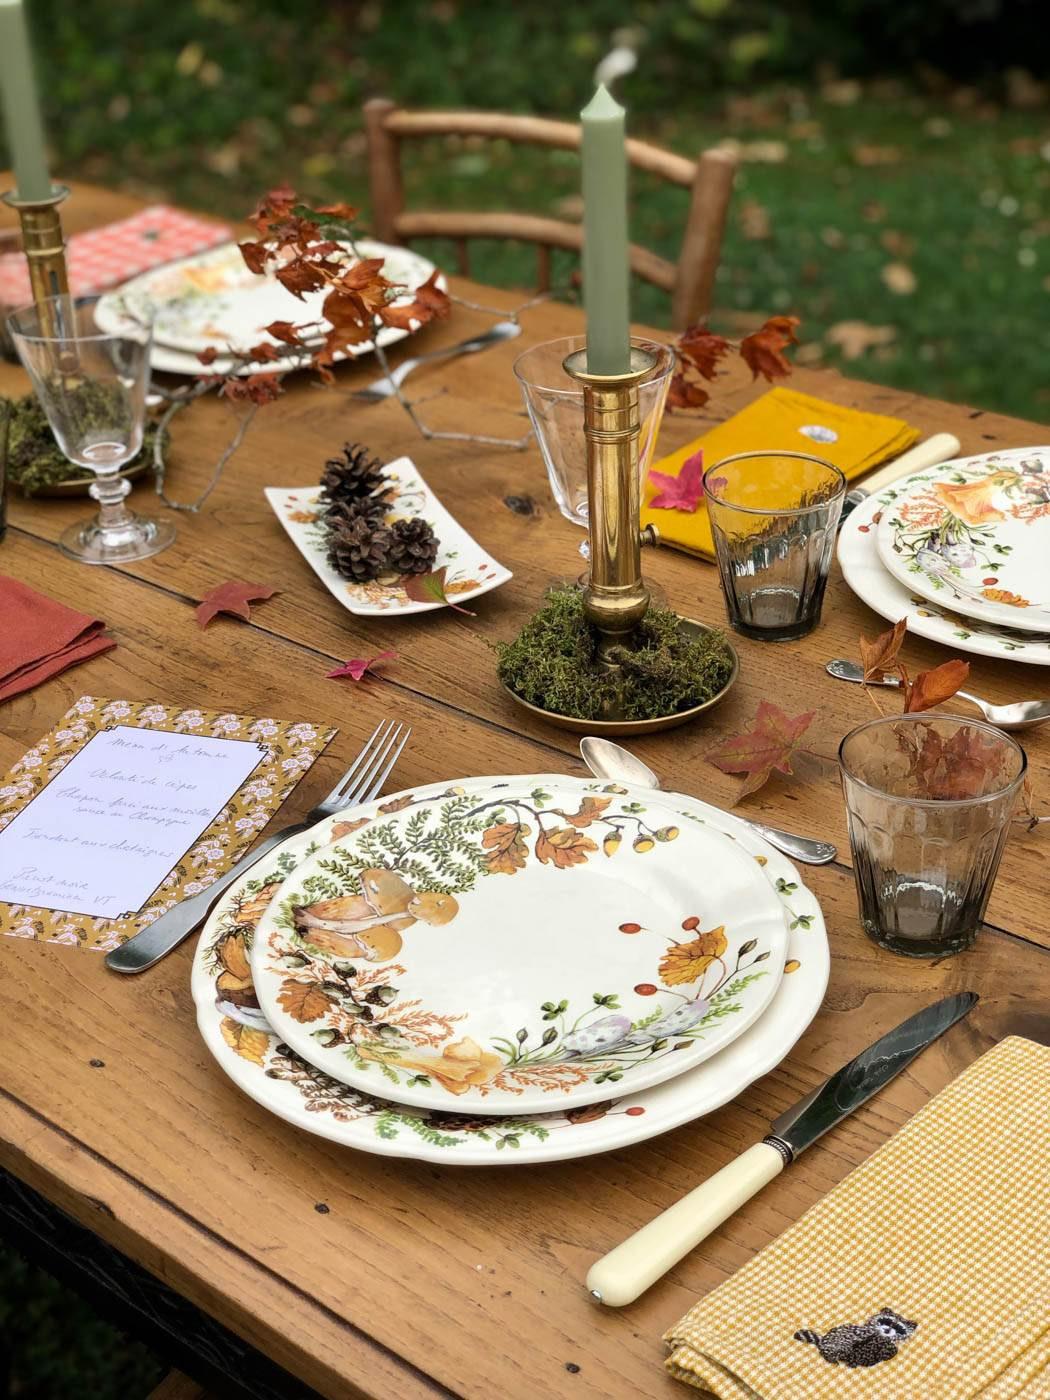 An outdoor Autumn table